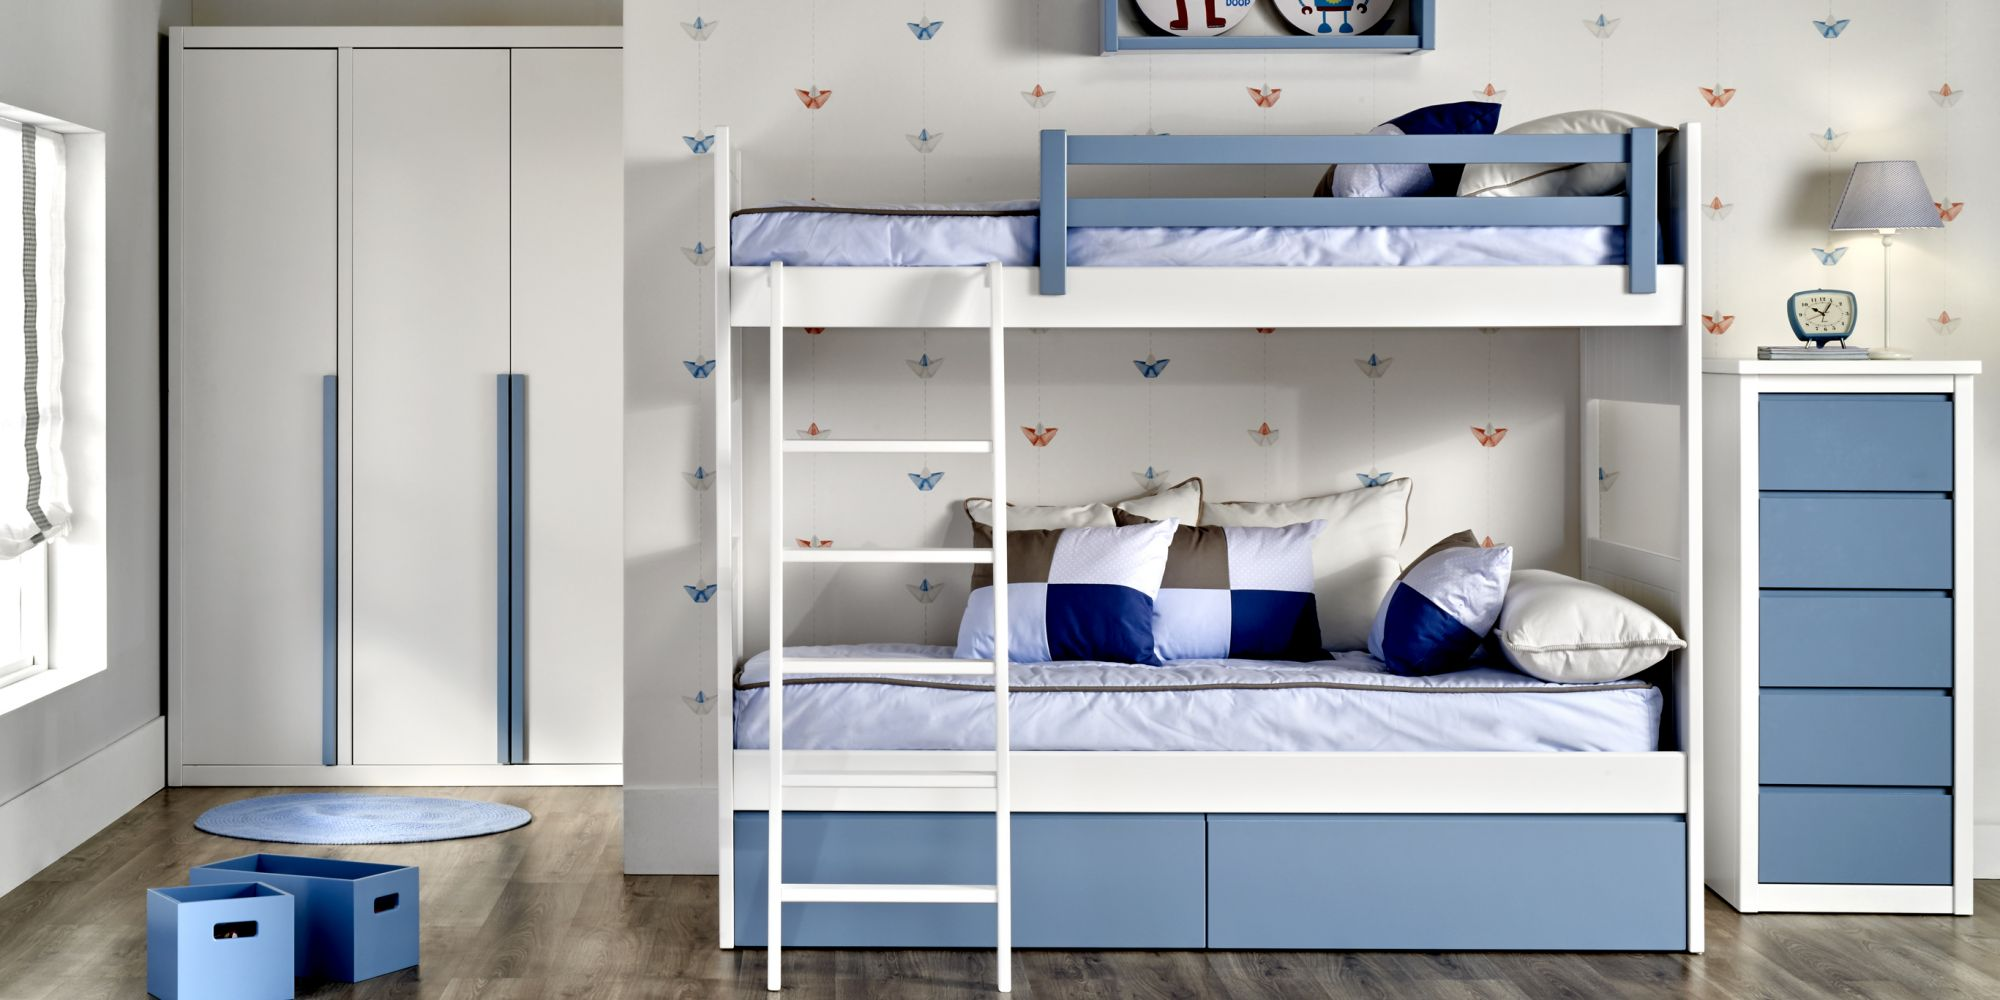 Literas infantiles barcelona camas literas abatibles sentido horizontal camas literas abatibles - Camas infantiles barcelona ...